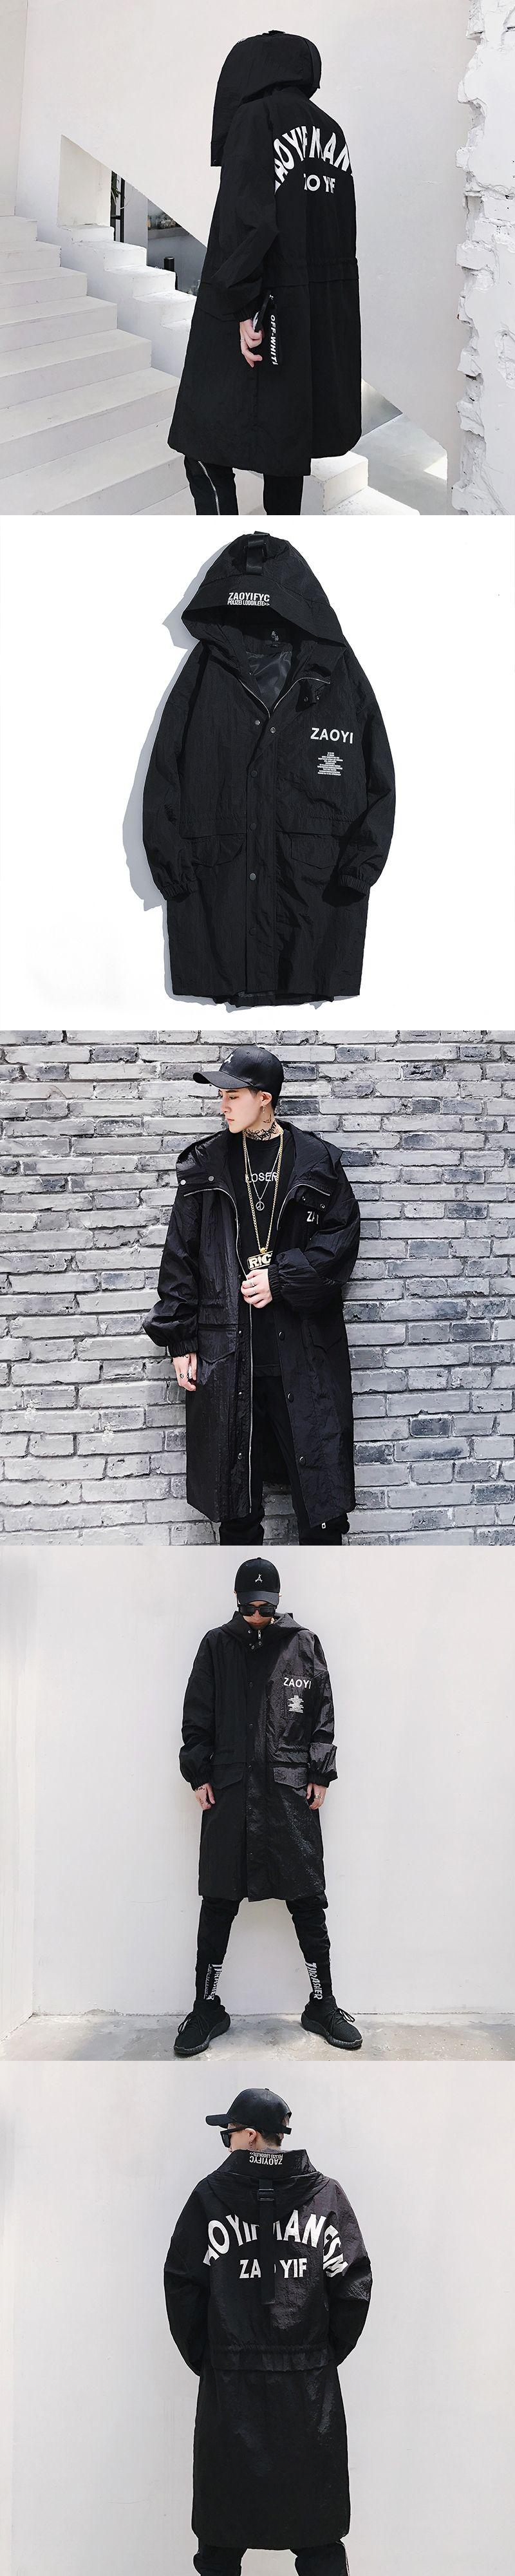 5e23d98f3 2017 New Casual Men s Loose Coat Punk Style Long Jacket Hooded ...